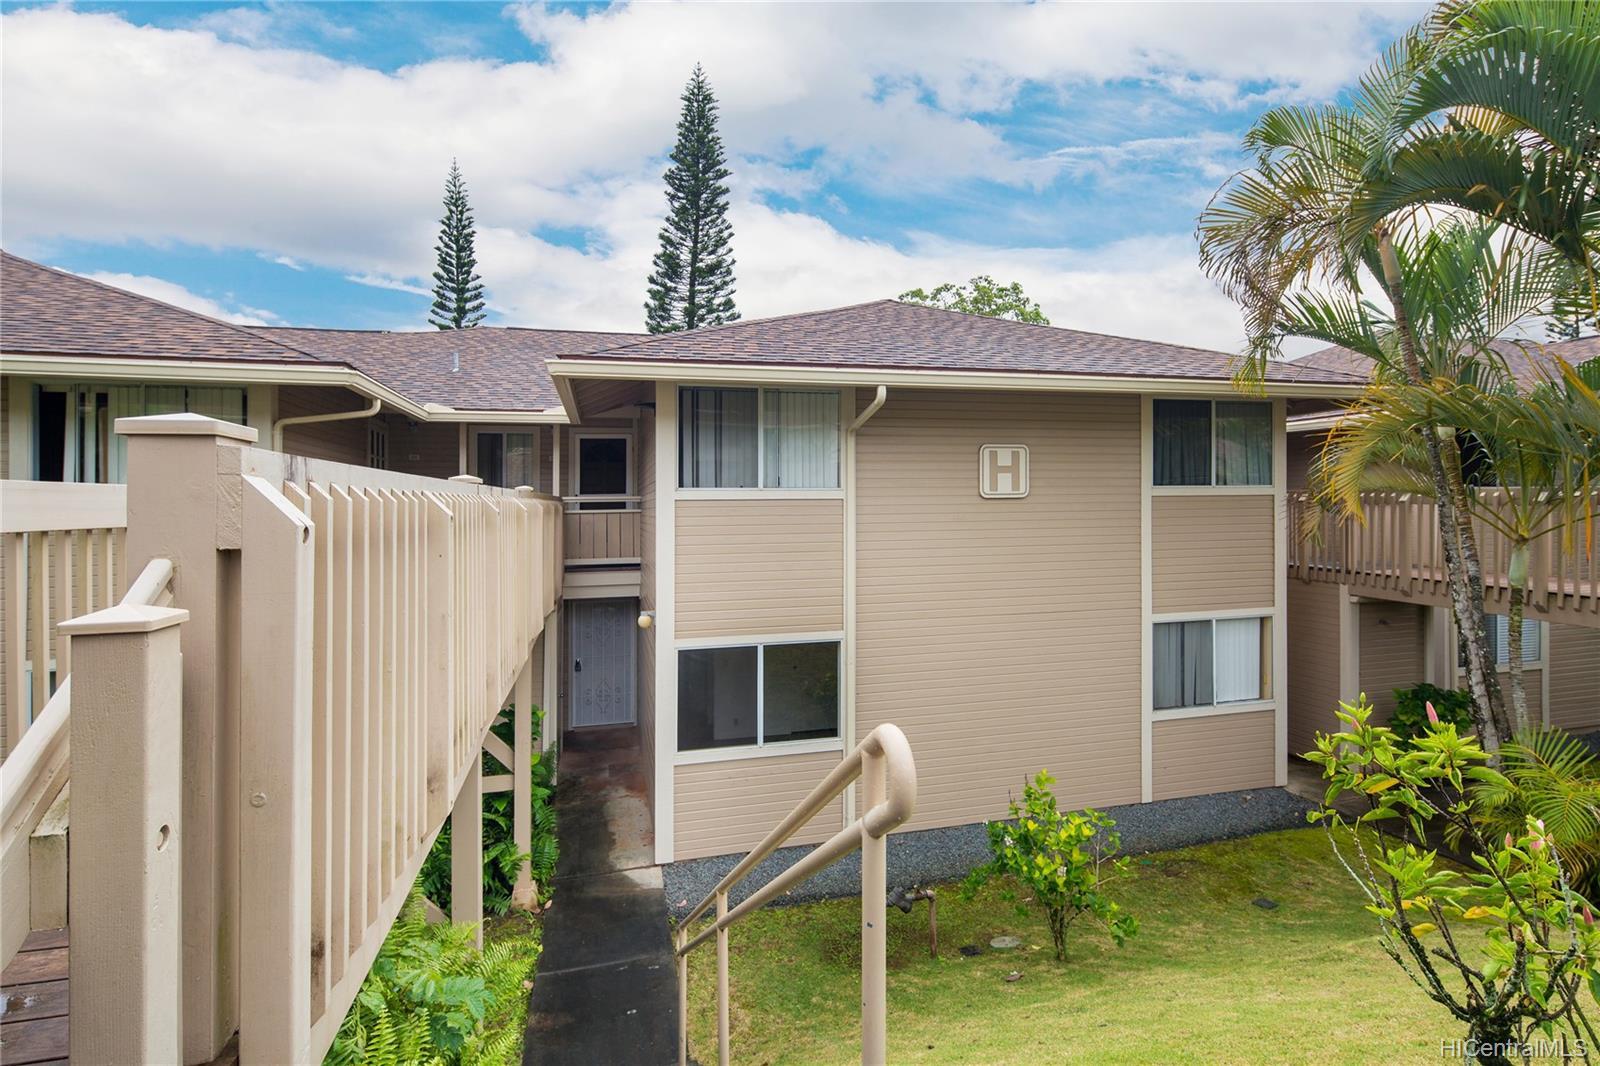 95-510 Wikao Street townhouse # H103, Mililani, Hawaii - photo 12 of 18